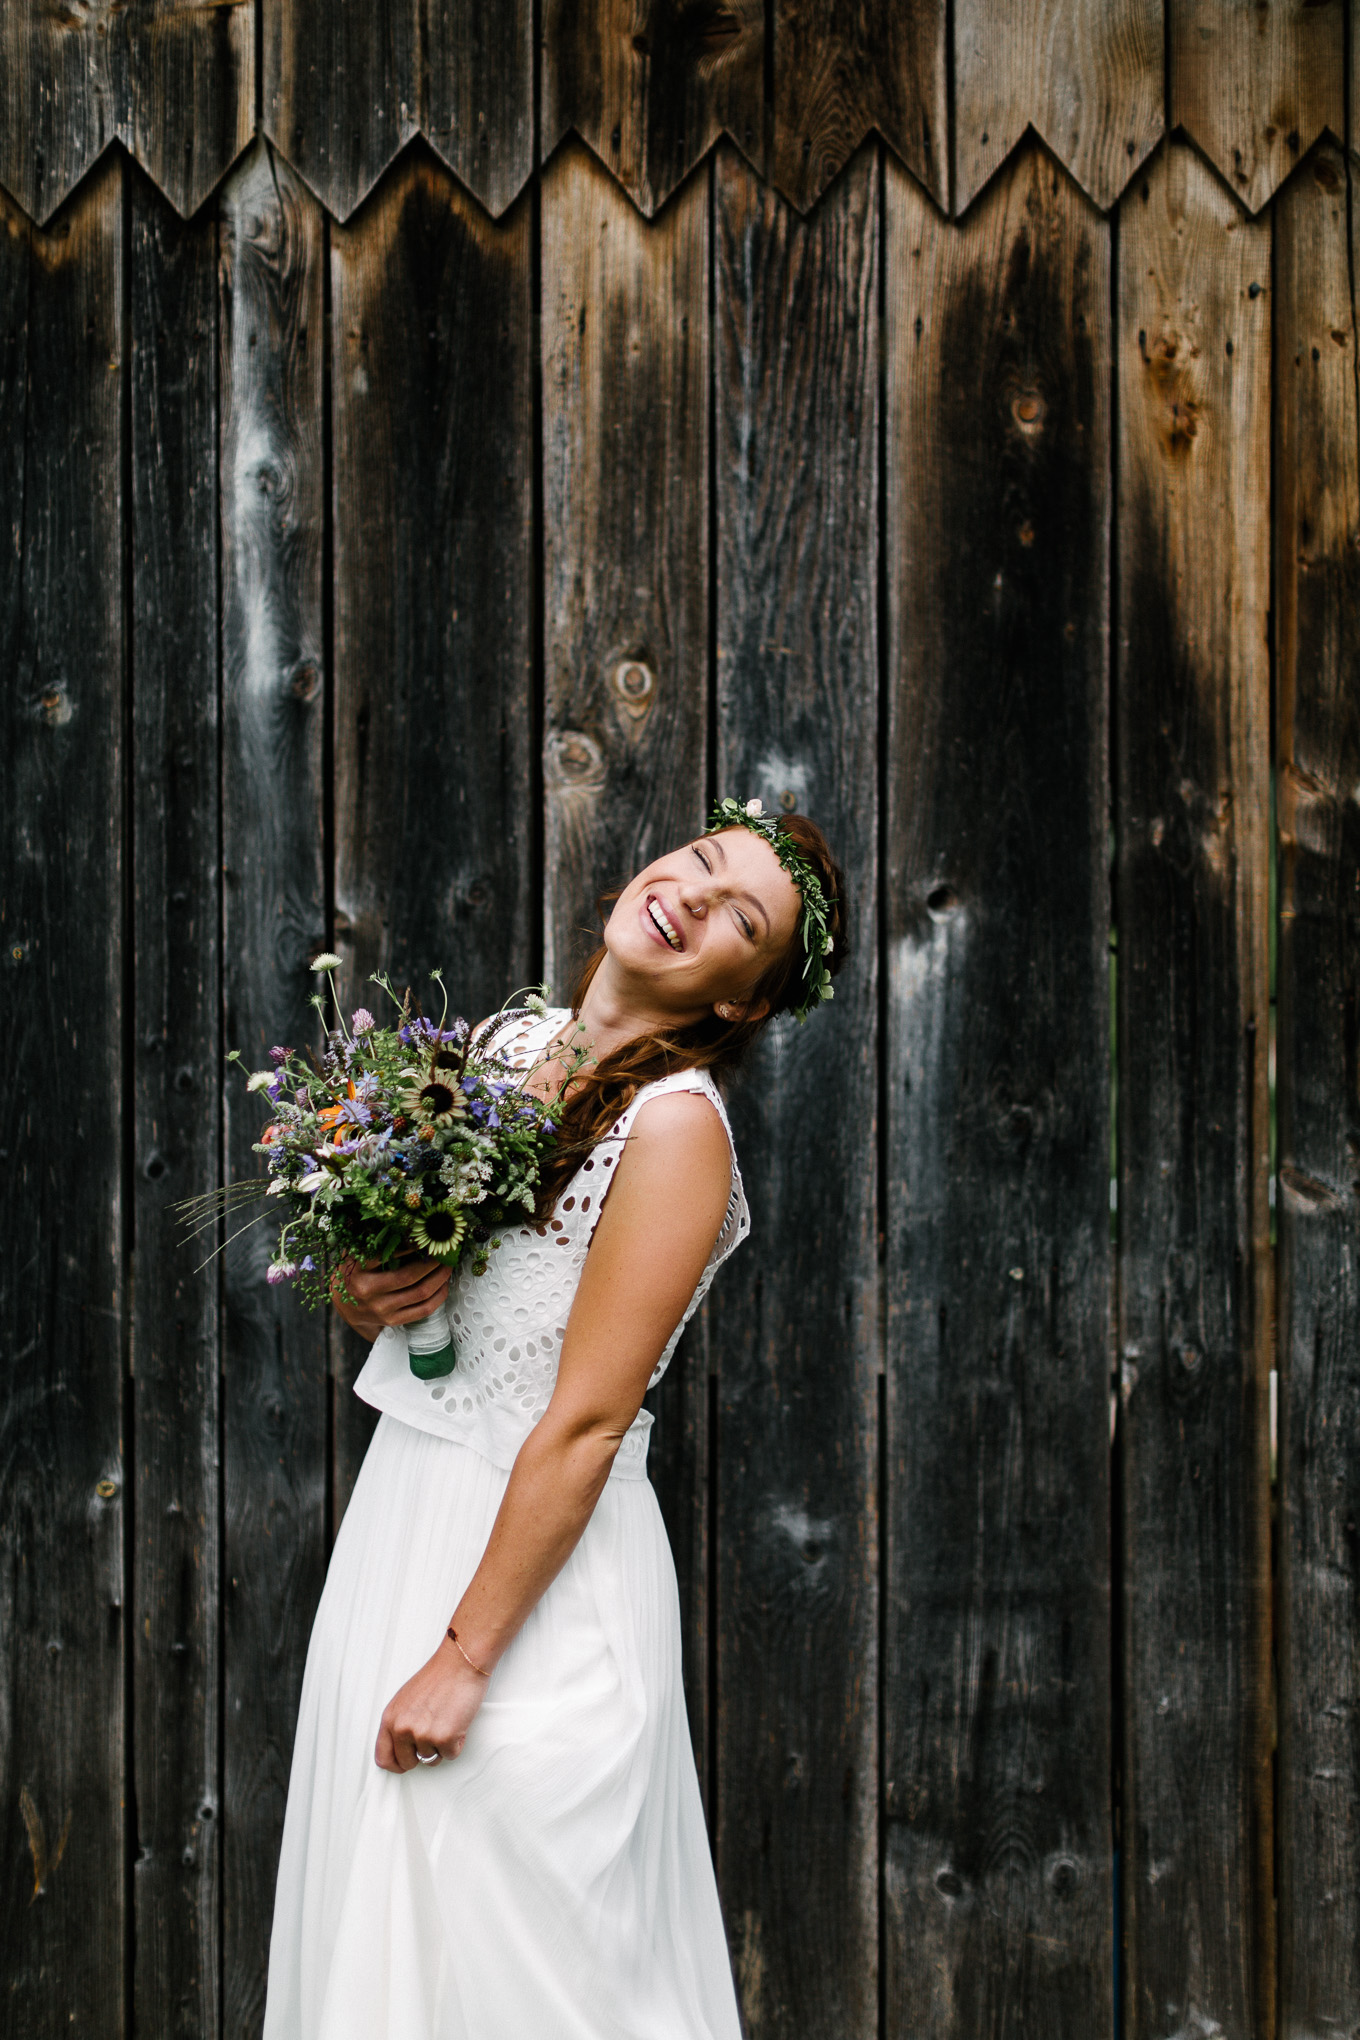 Boho-Scheune-Bauern-Hochzeit-Lörrach-Rheinfelden-Pia-Anna-Christian-Photography-NC-4.jpg